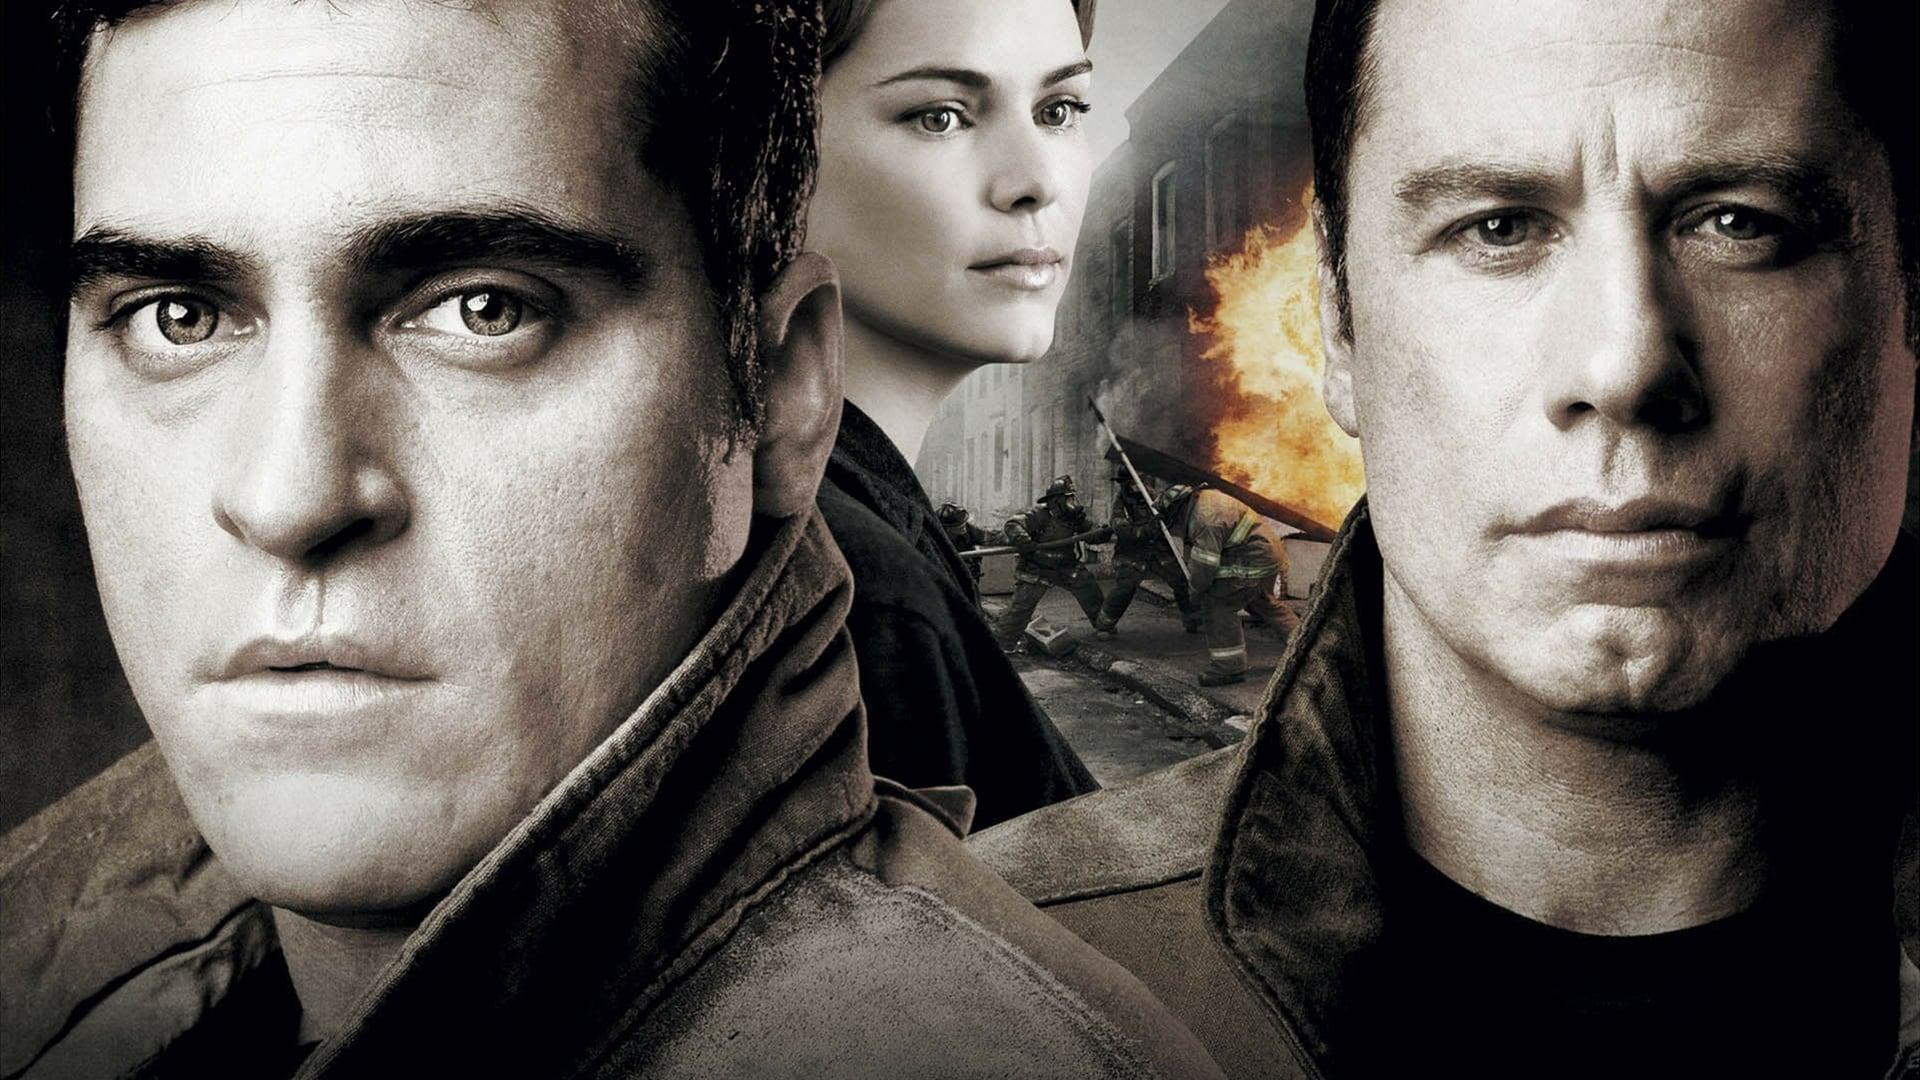 Squadra 49 (2004)